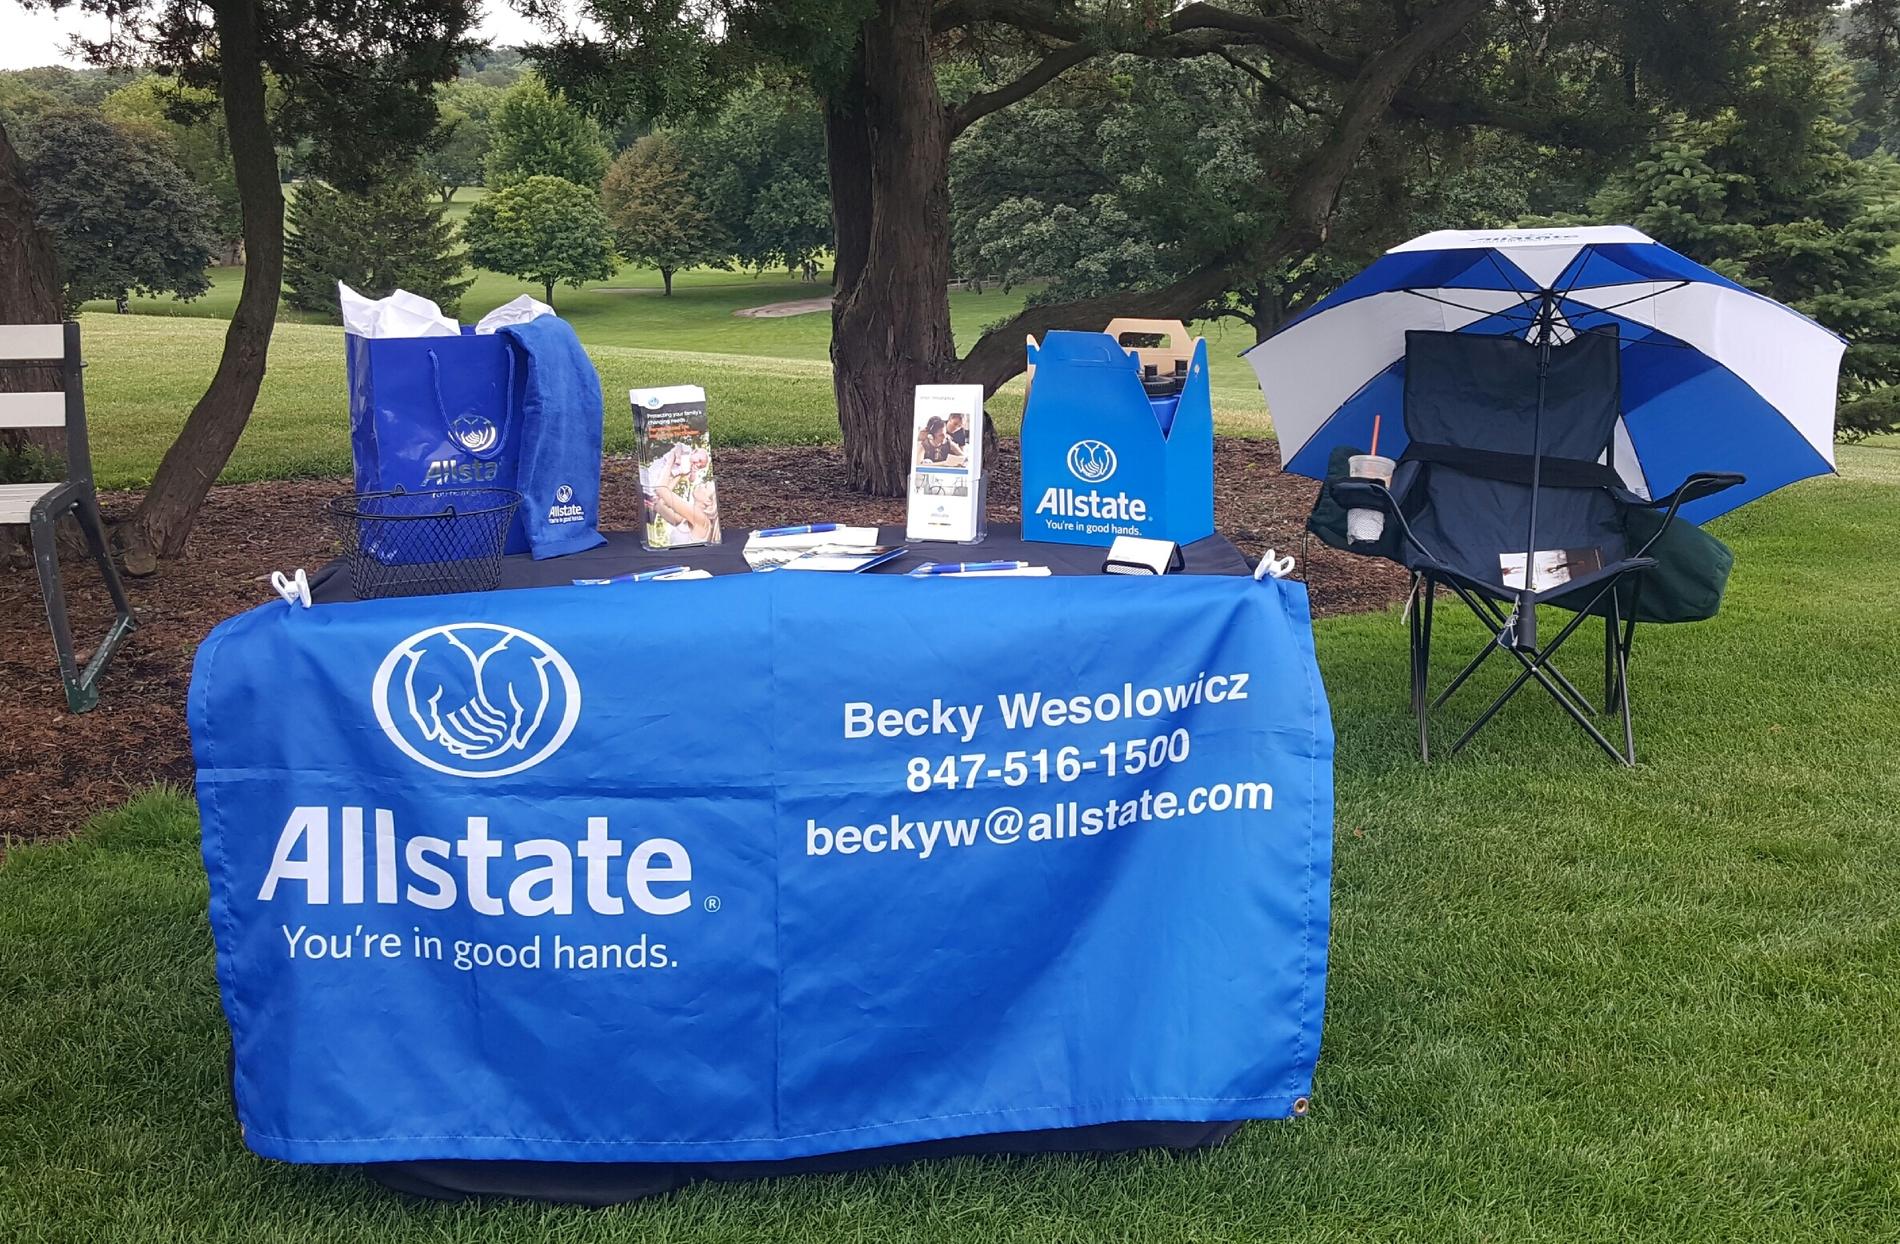 Rebecca Wesolowicz: Allstate Insurance image 10